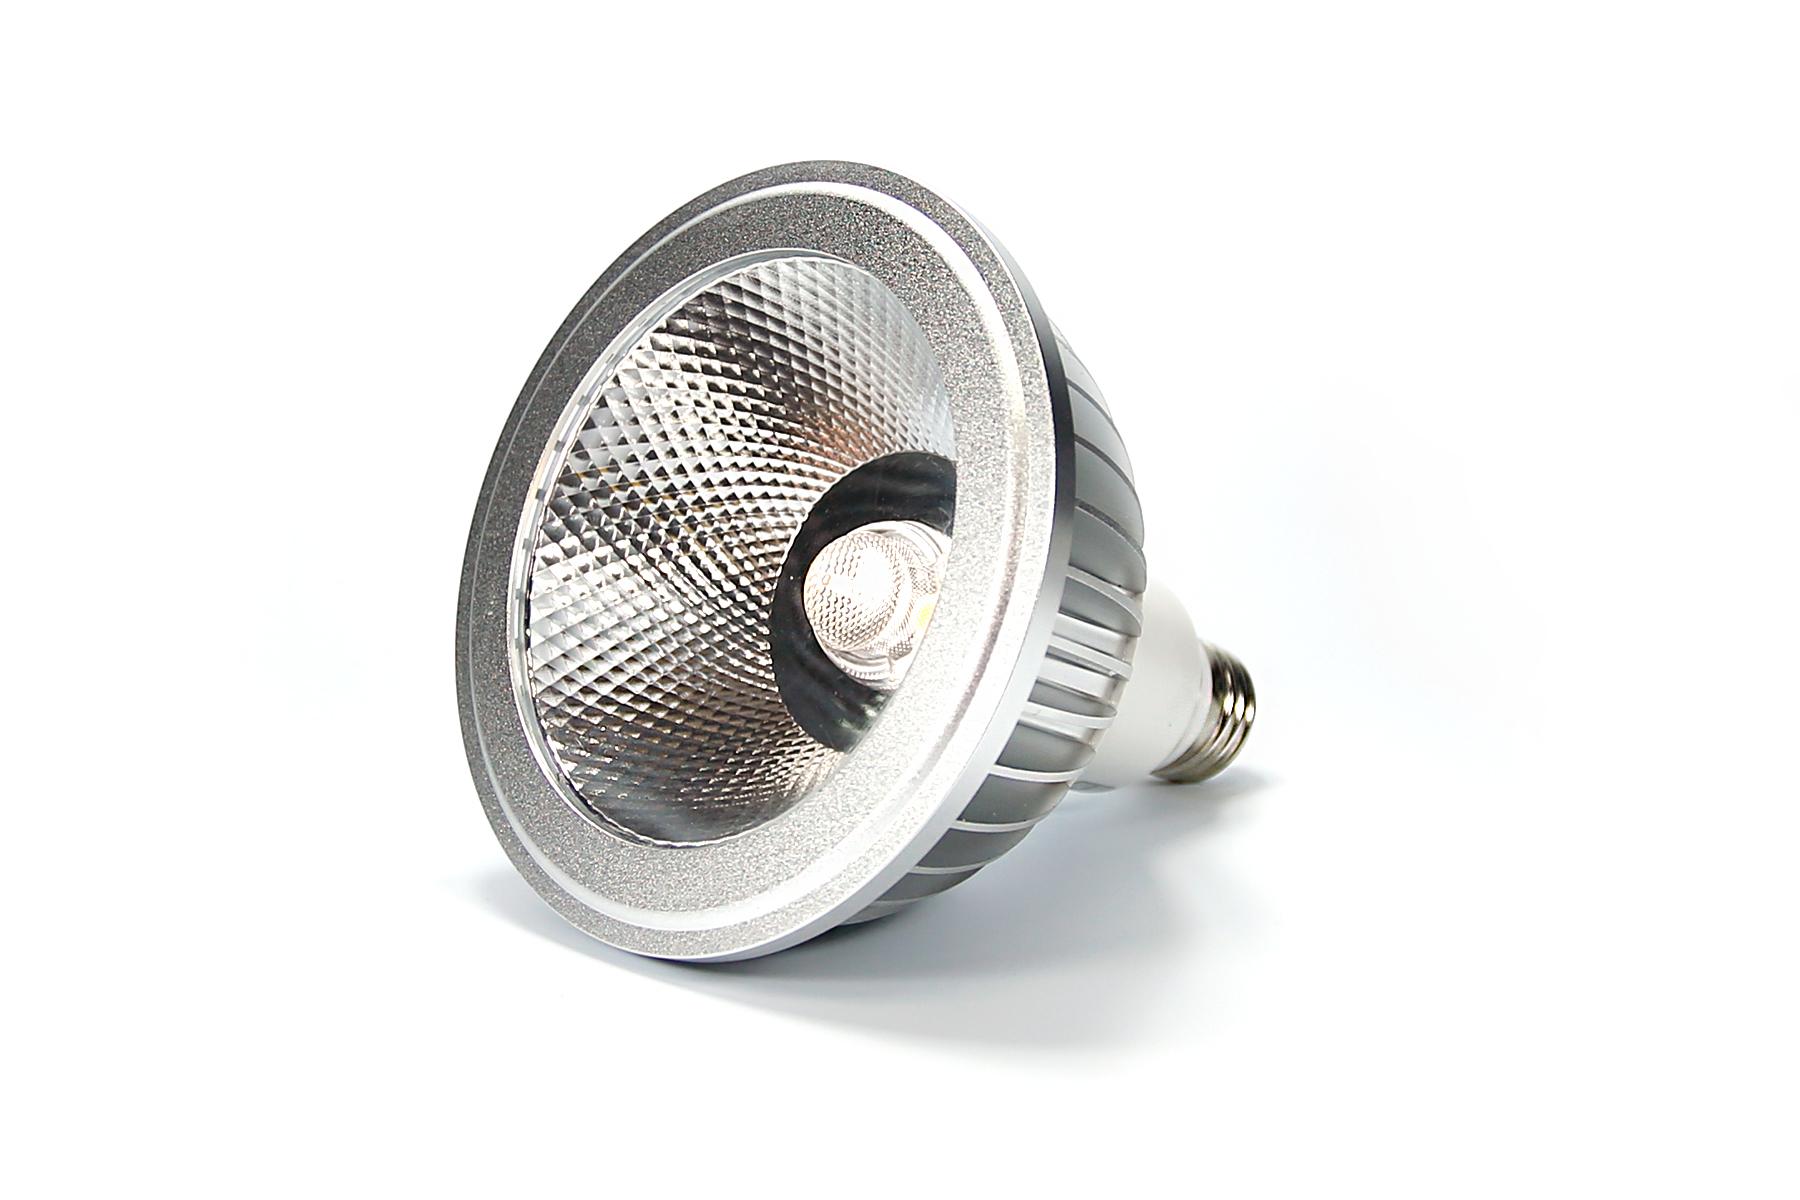 PAR30A14W3018KWD SunLight2 PAR30 14W 120V AC High CRI Dim to Warm LED Bulb